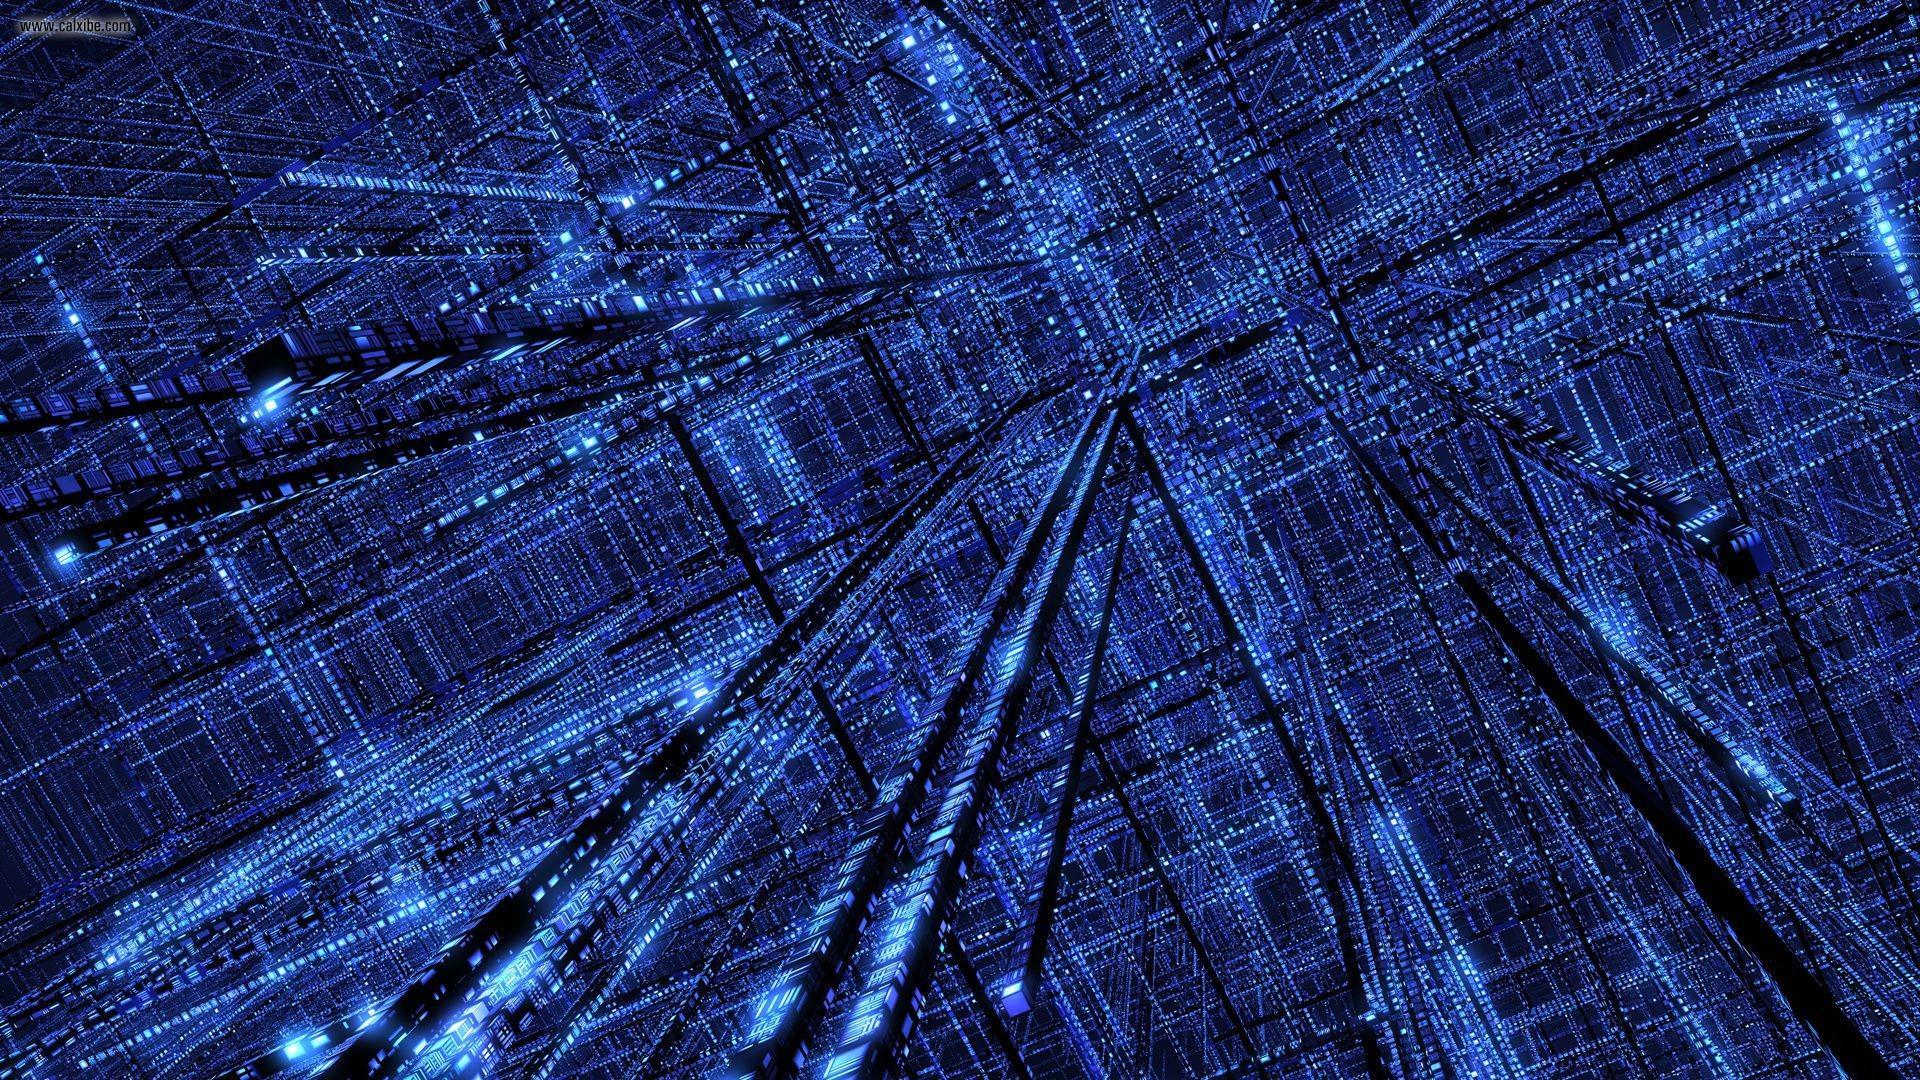 24076) Blue Matrix Background Wallpaper – WalOps.com